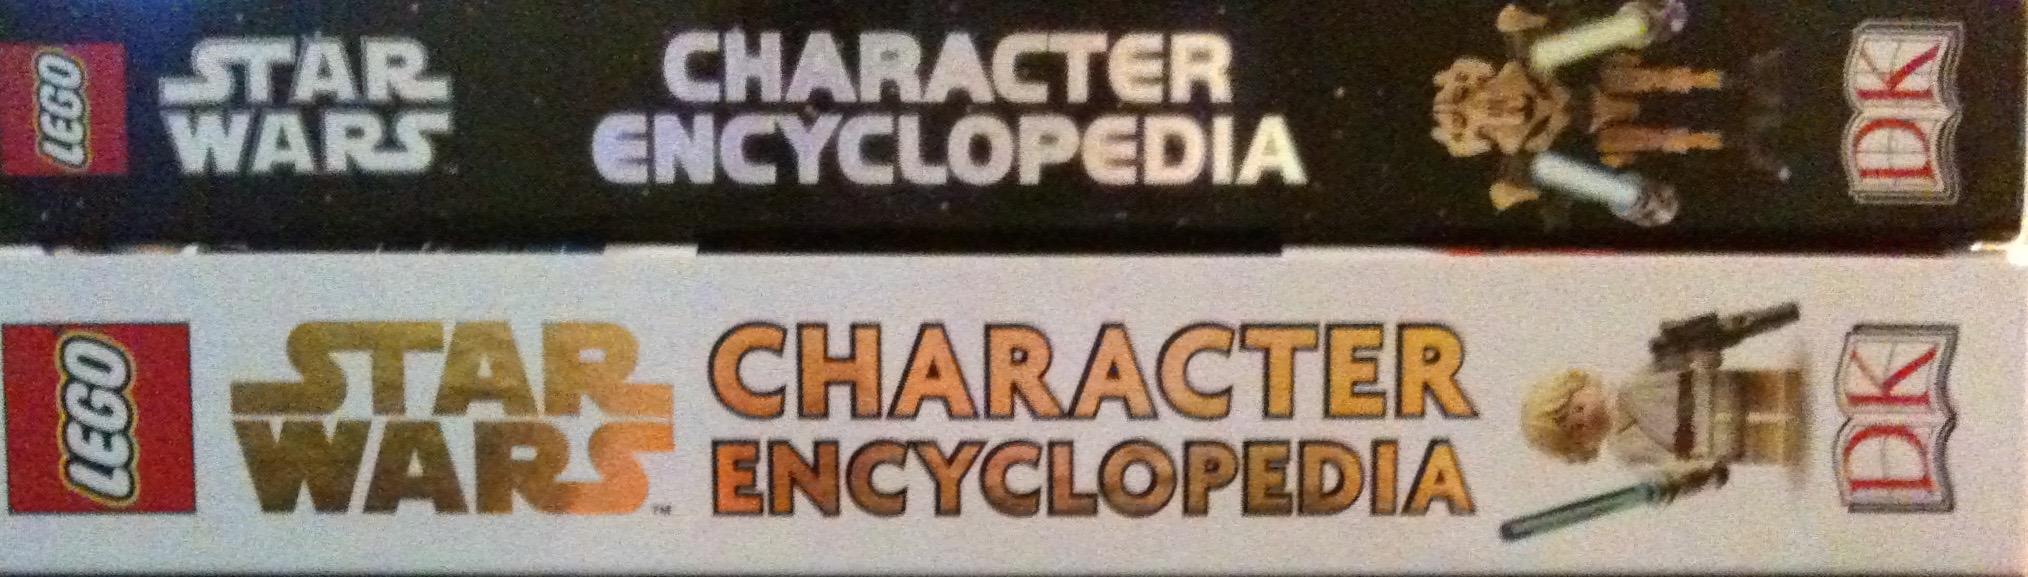 LEGO Star Wars 2nd Edition Encyclopedia Spine Comparison